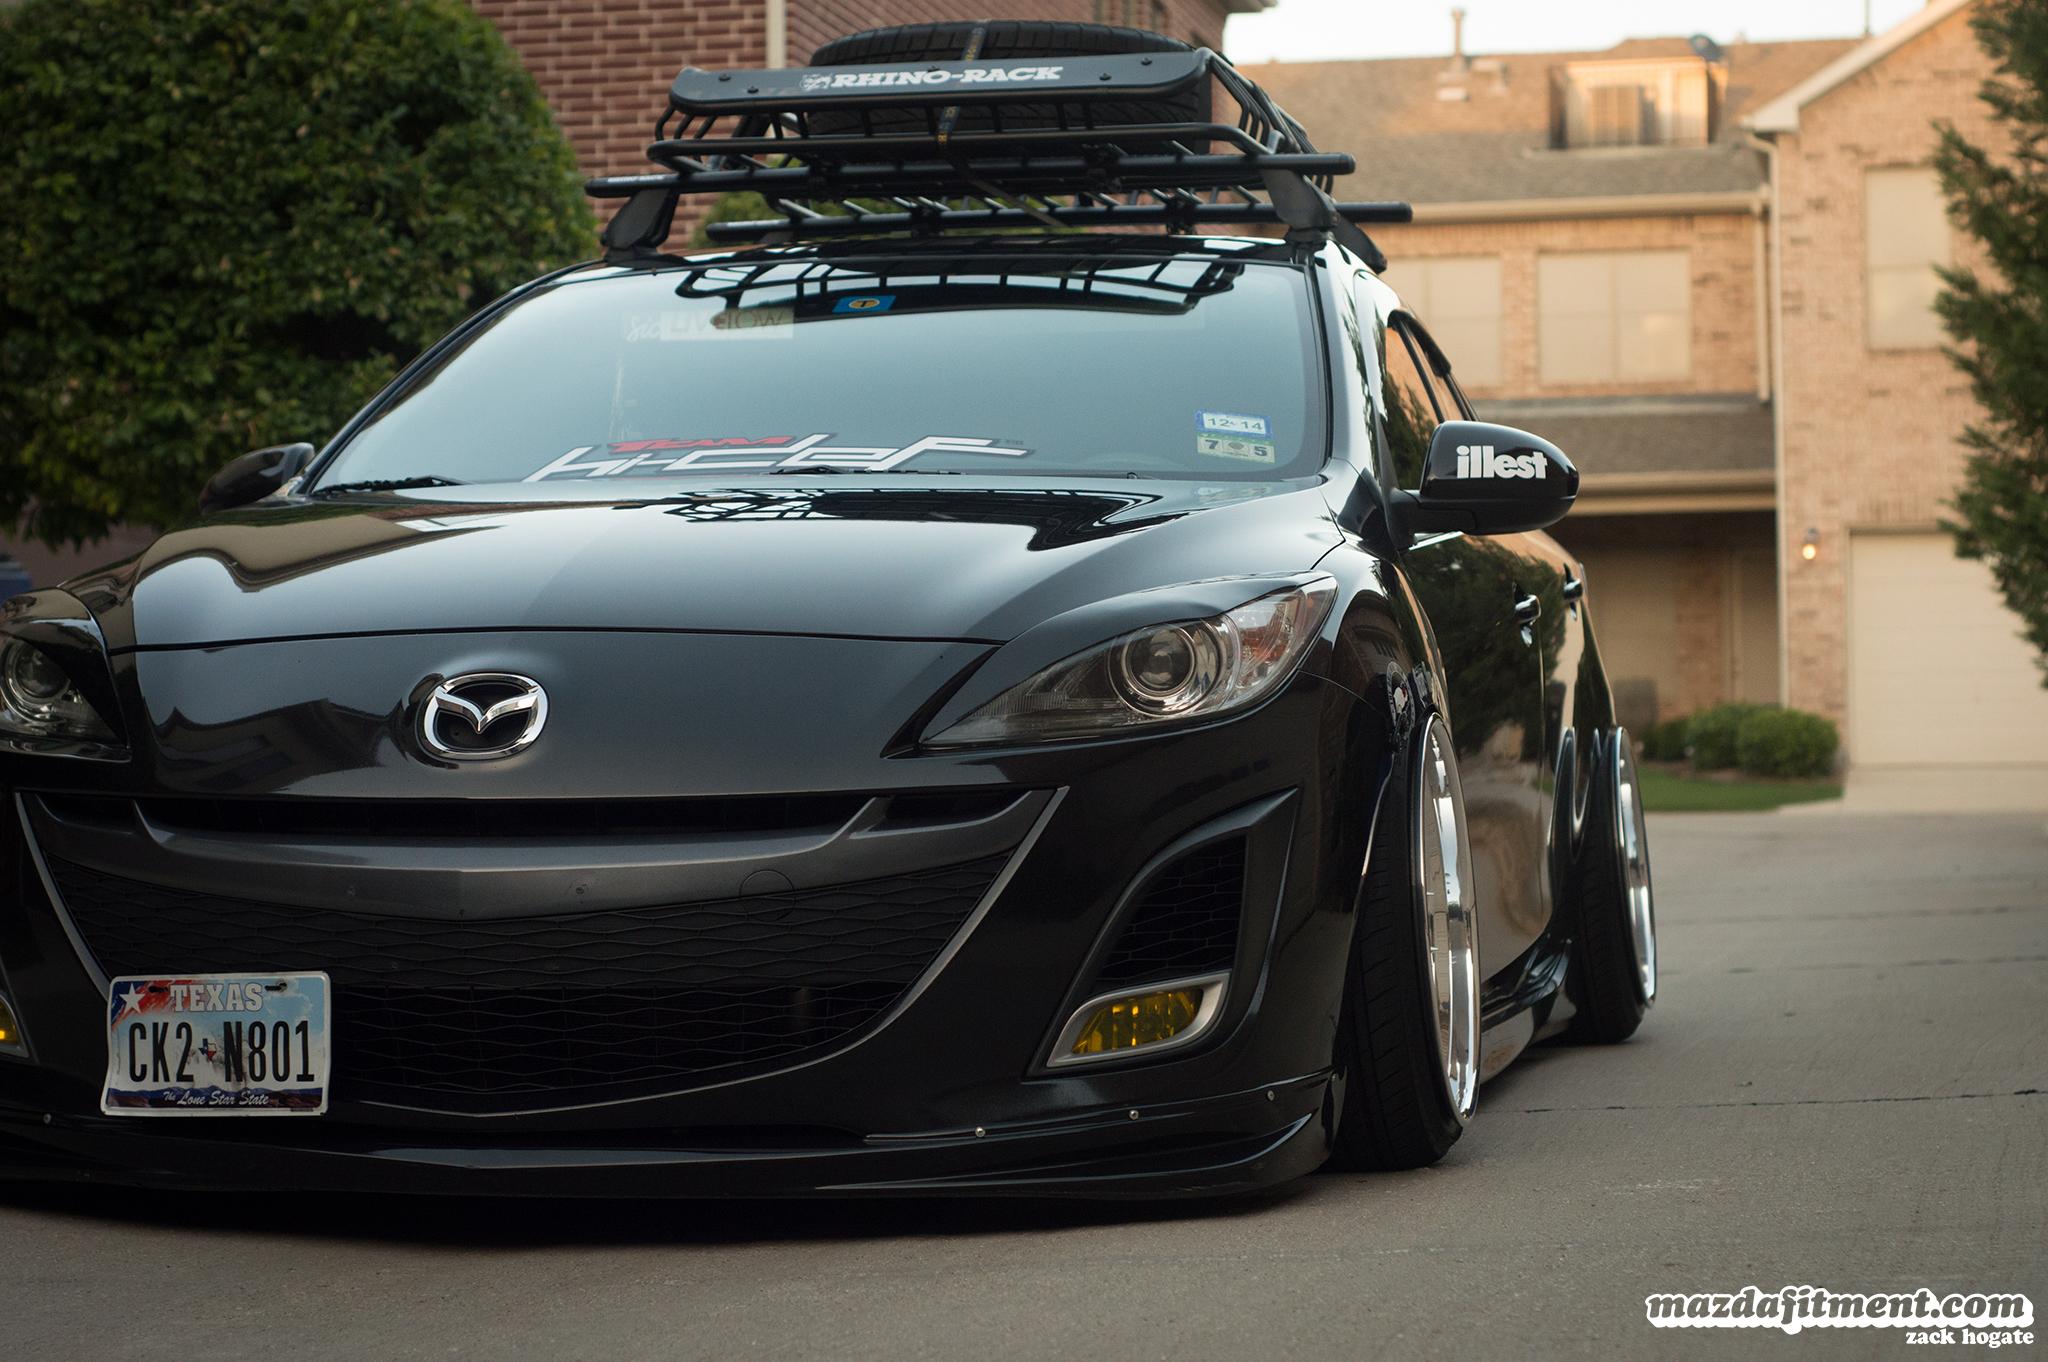 Texas Mz3 Mazda Fitment